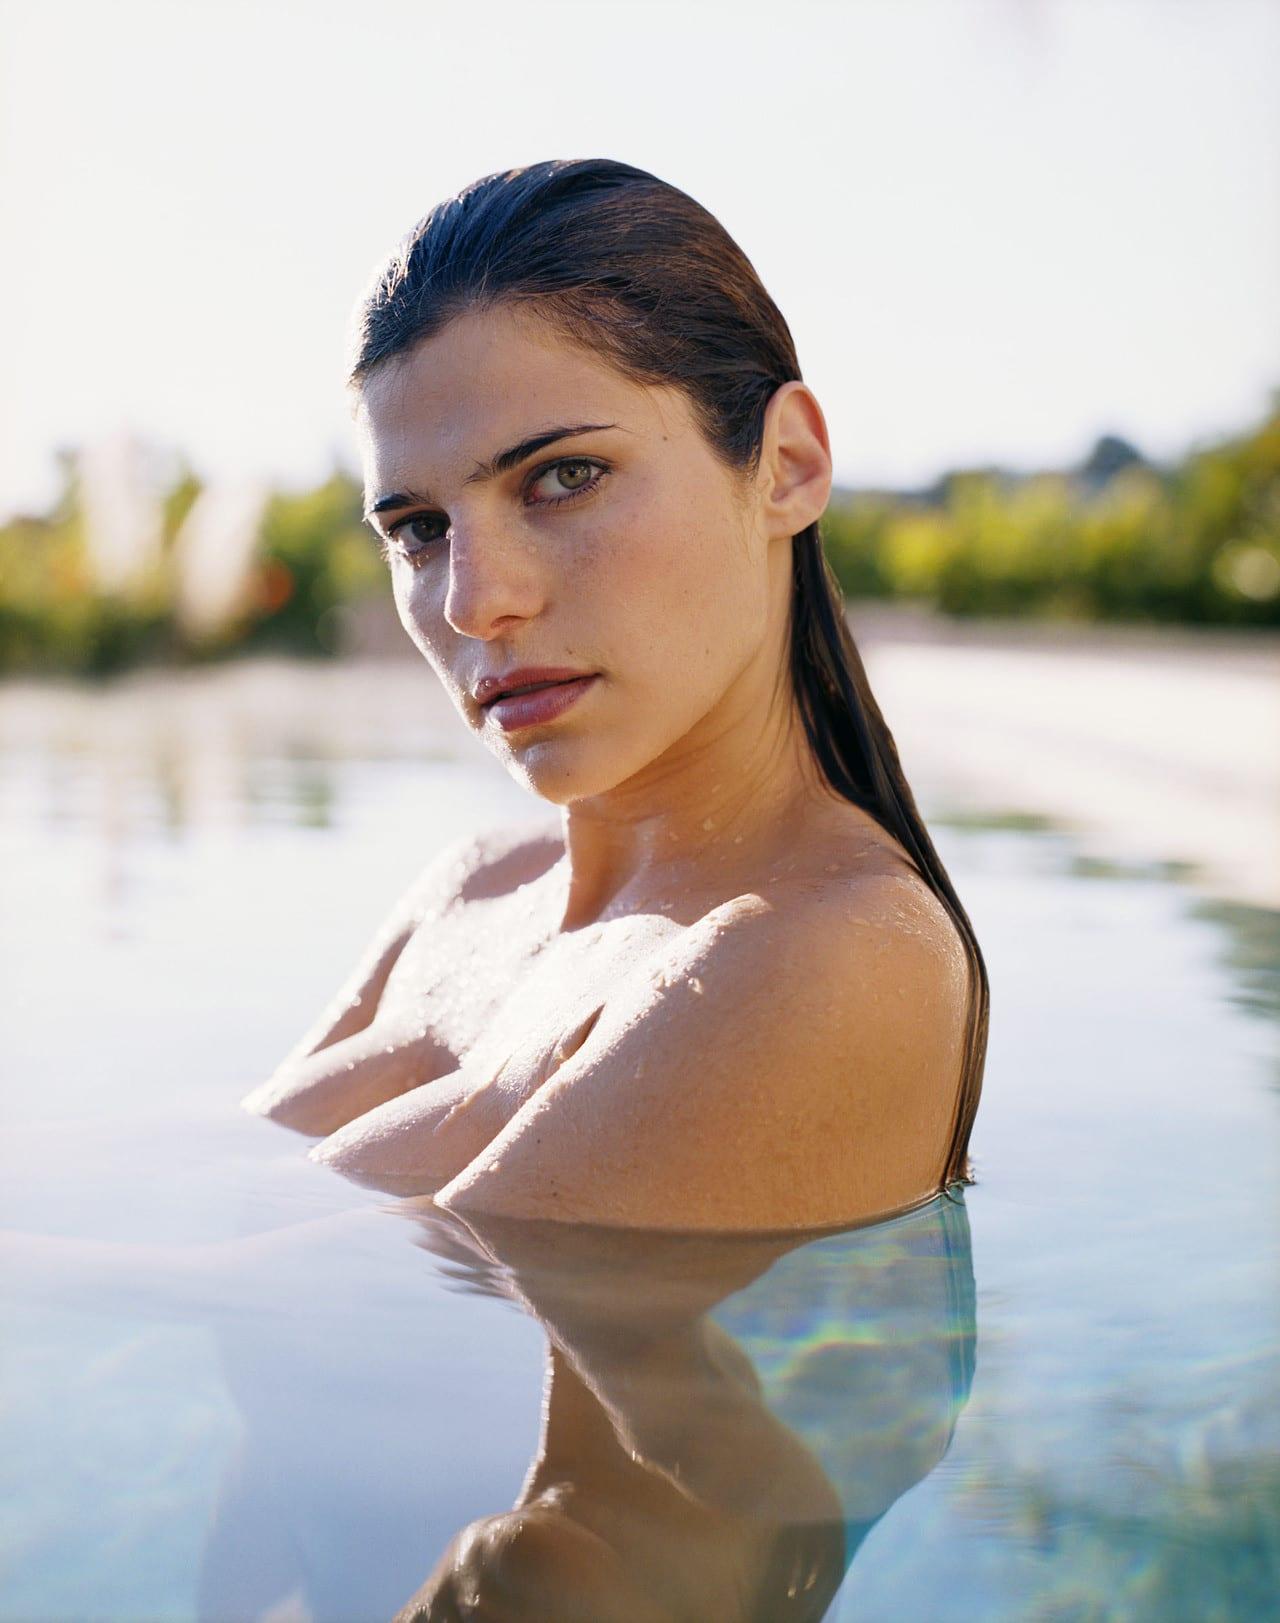 Lake Bell's Fantastic Breasts